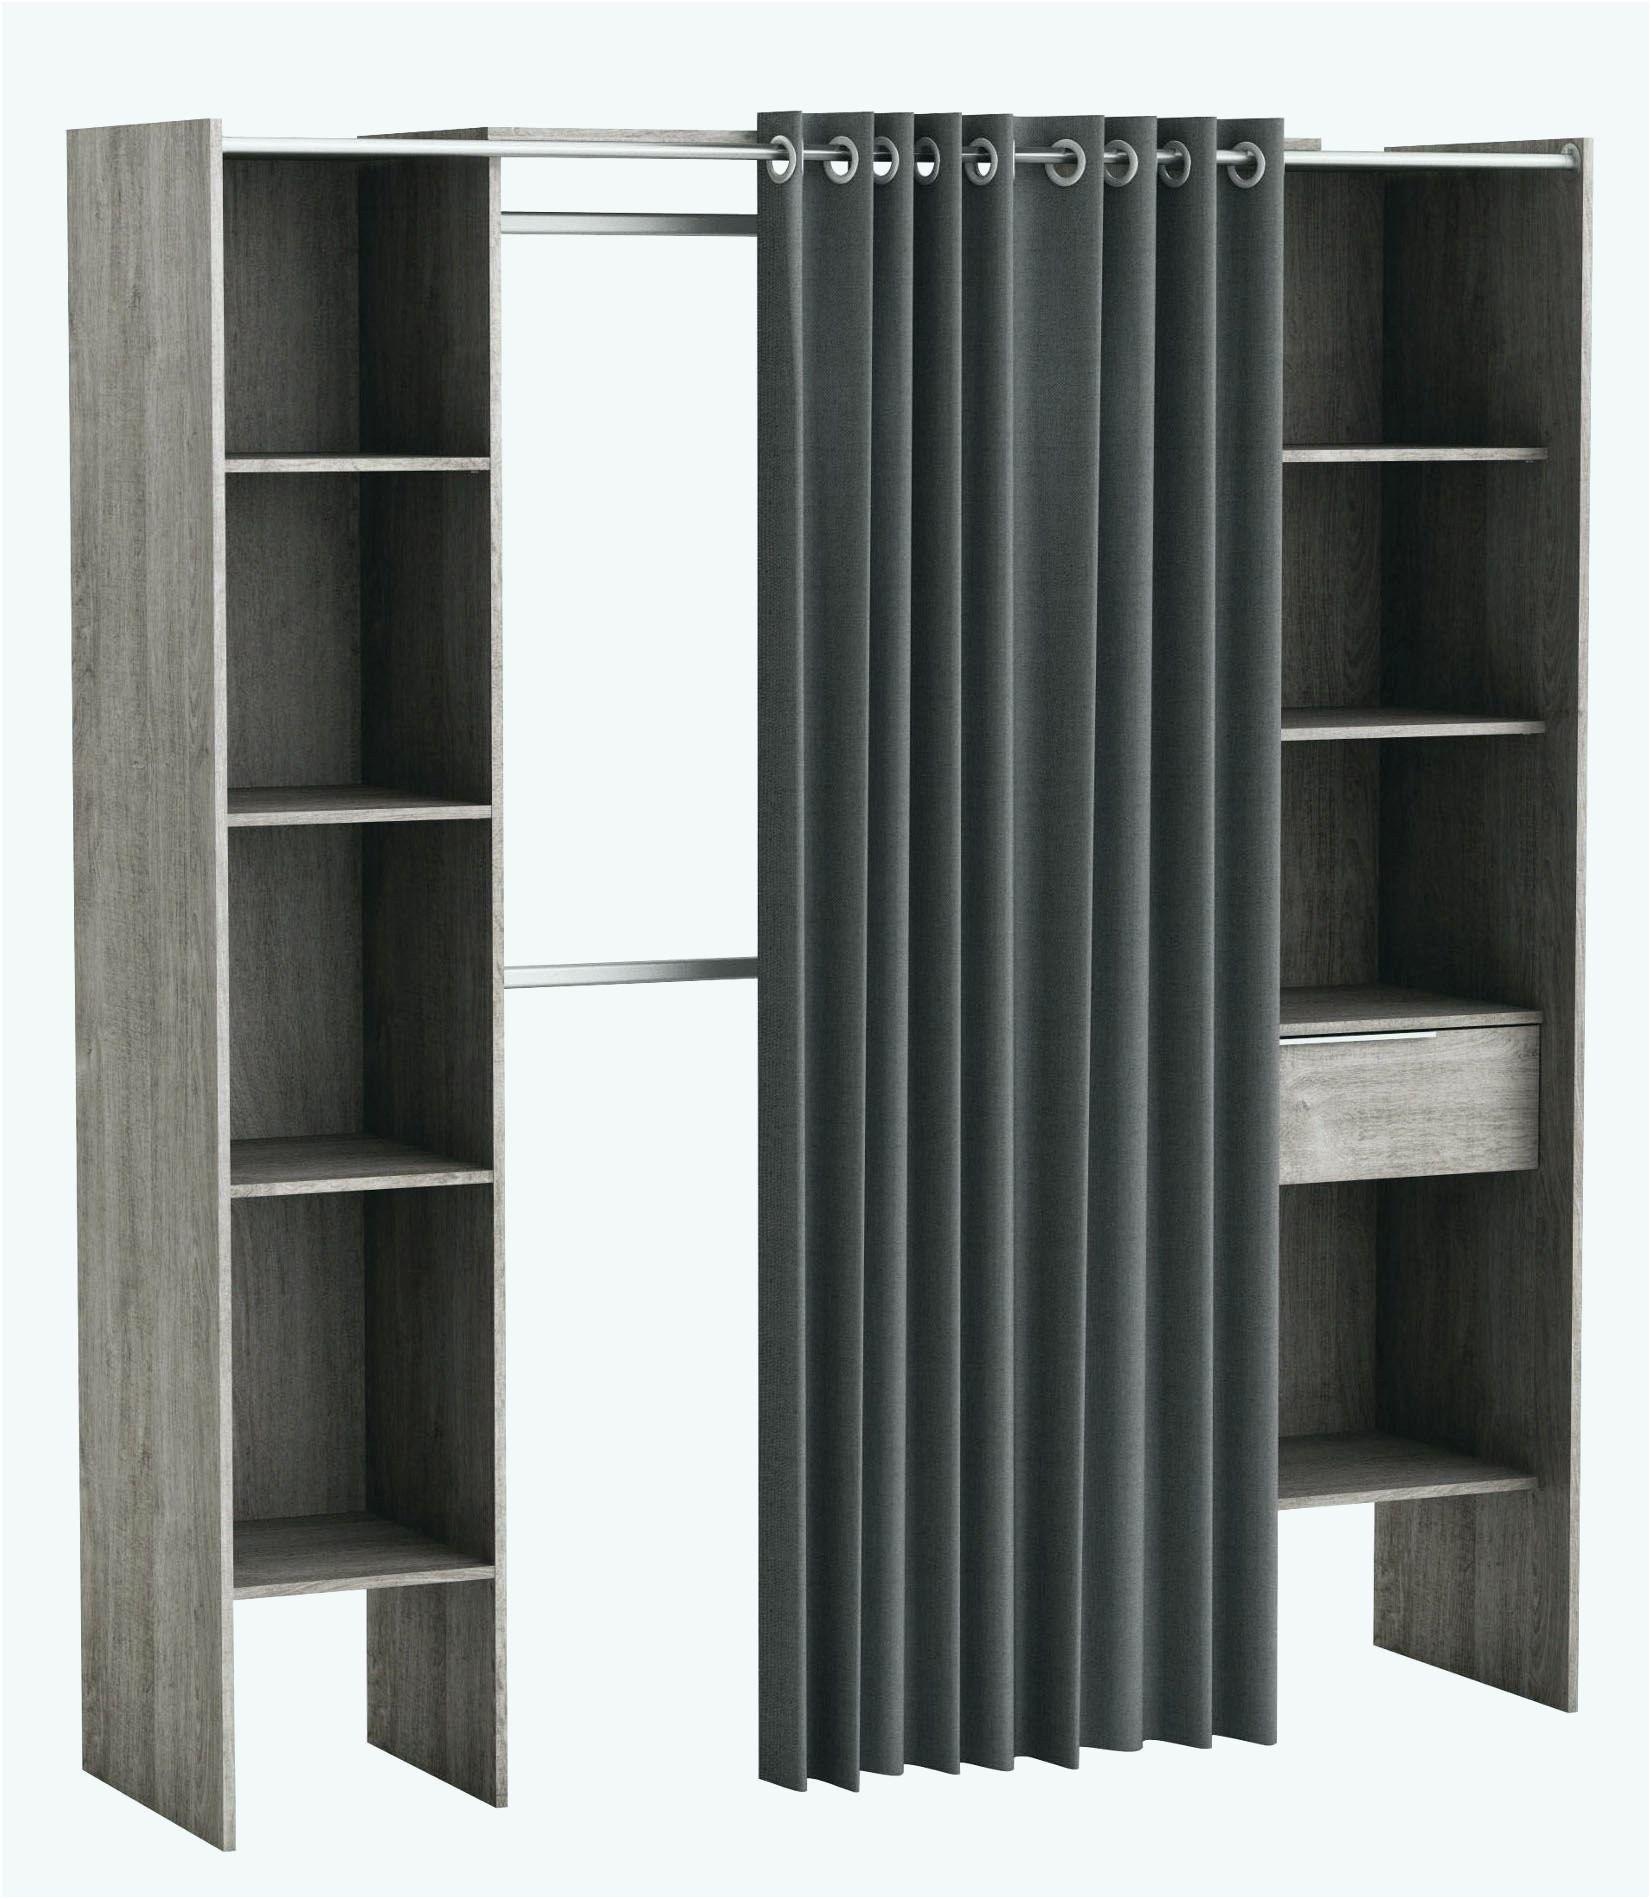 11 Cool Meuble Classeur Conforama Gallery Decor Modern Interior Design Shelving Unit